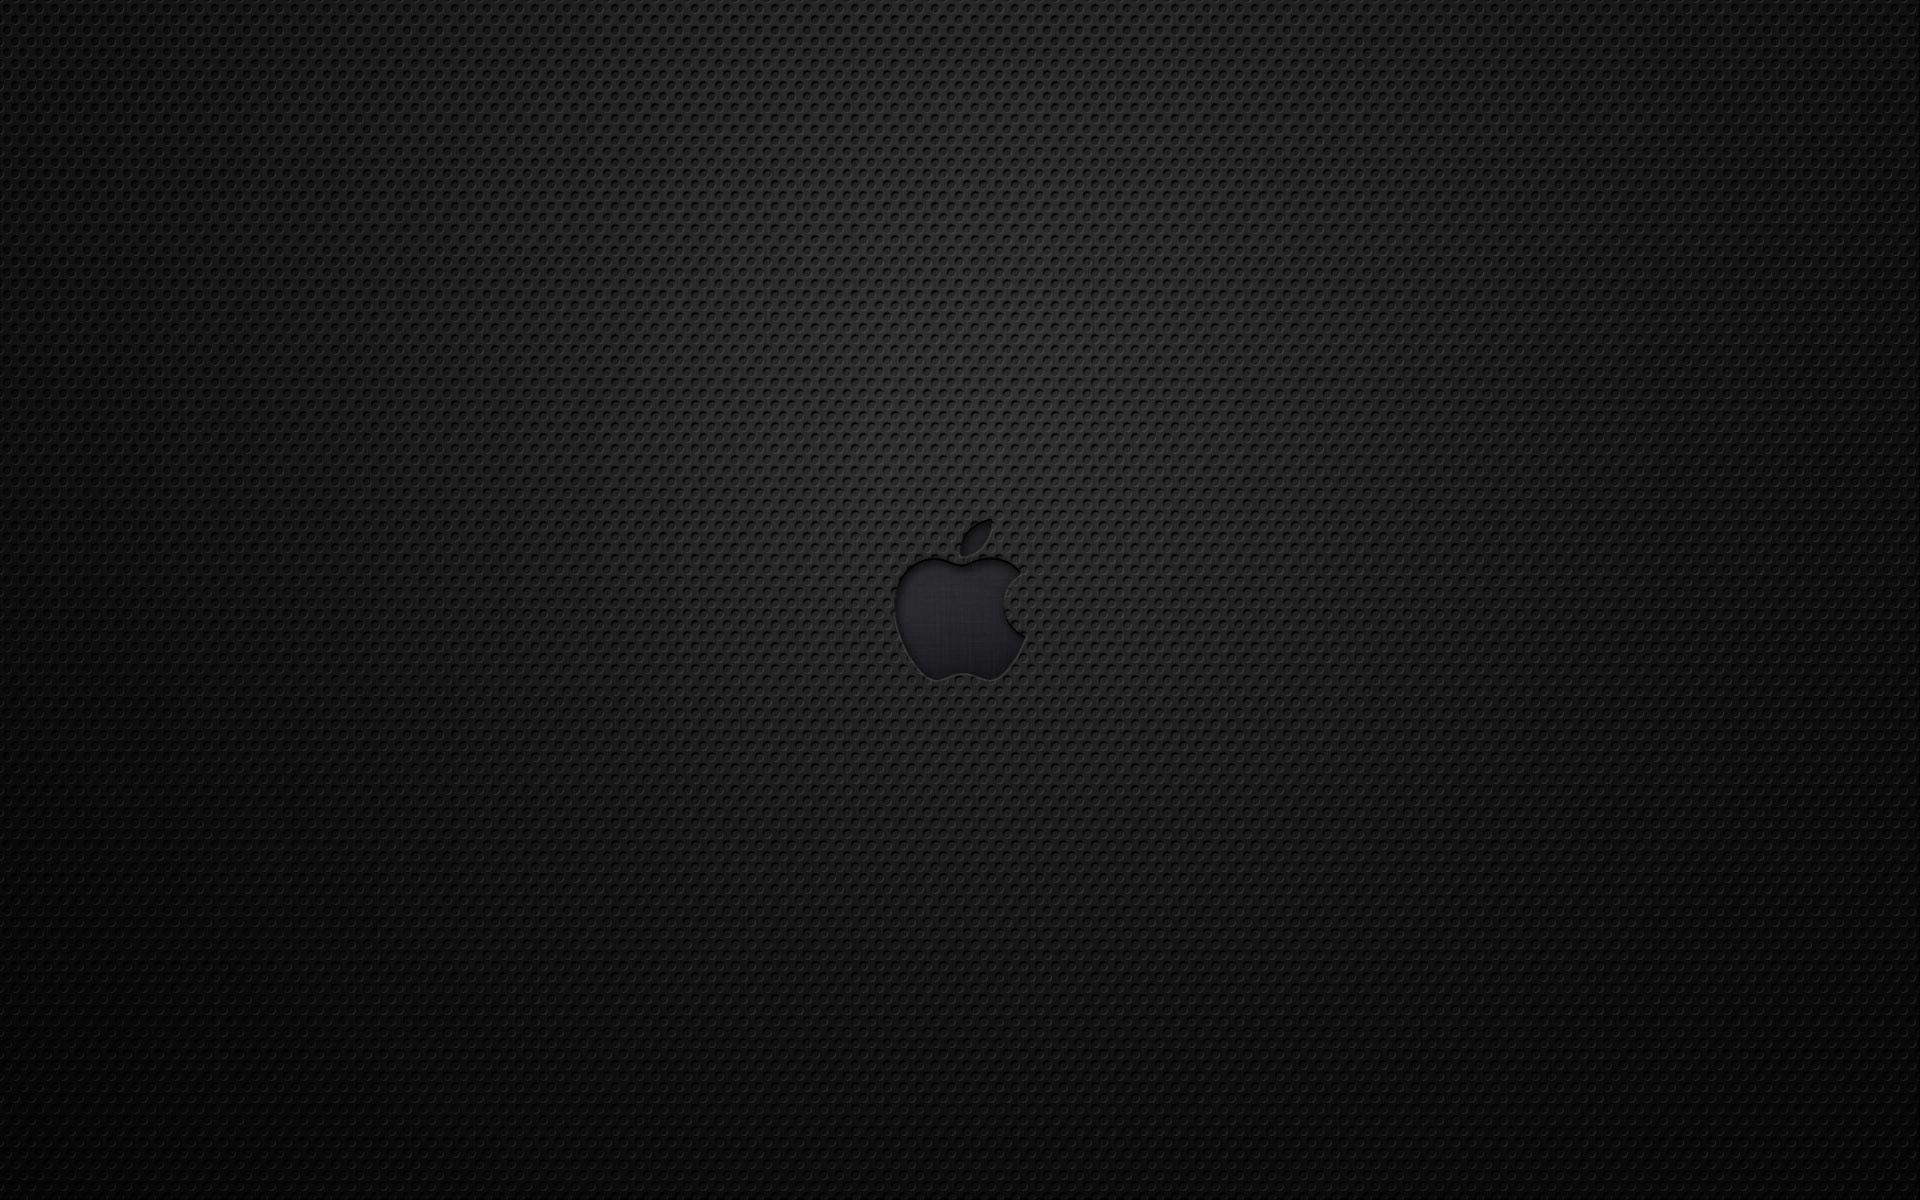 macbook wallpaper hd (71+ images)